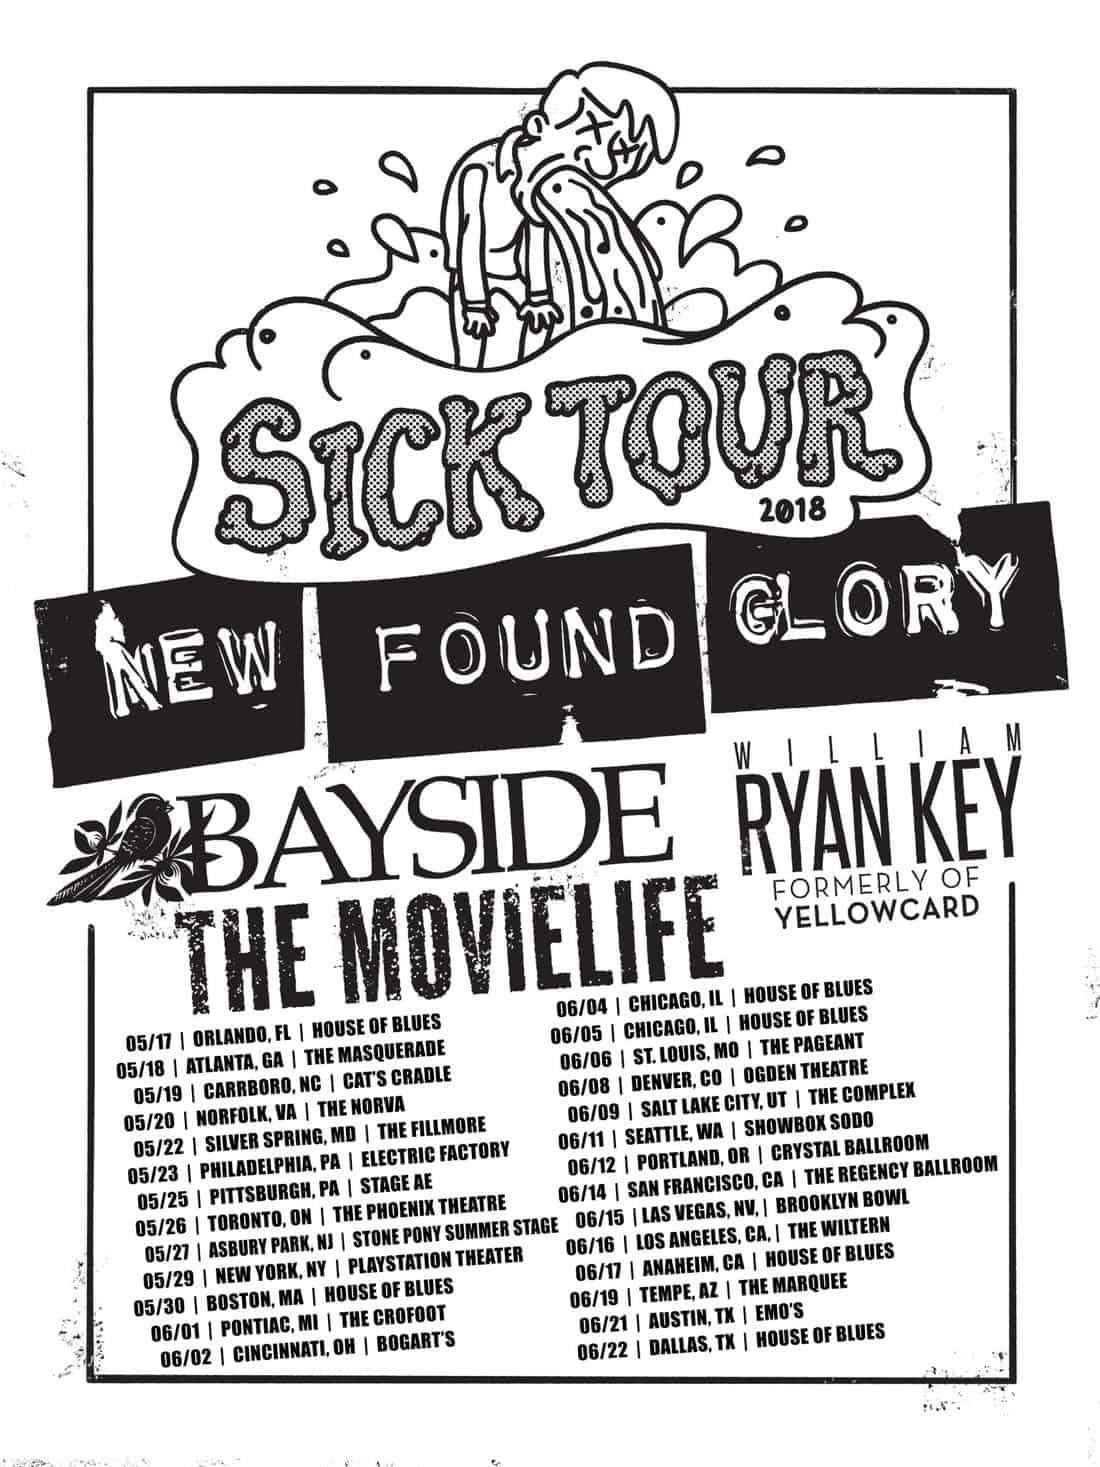 The-Sick-Tour-New-Found-Glory